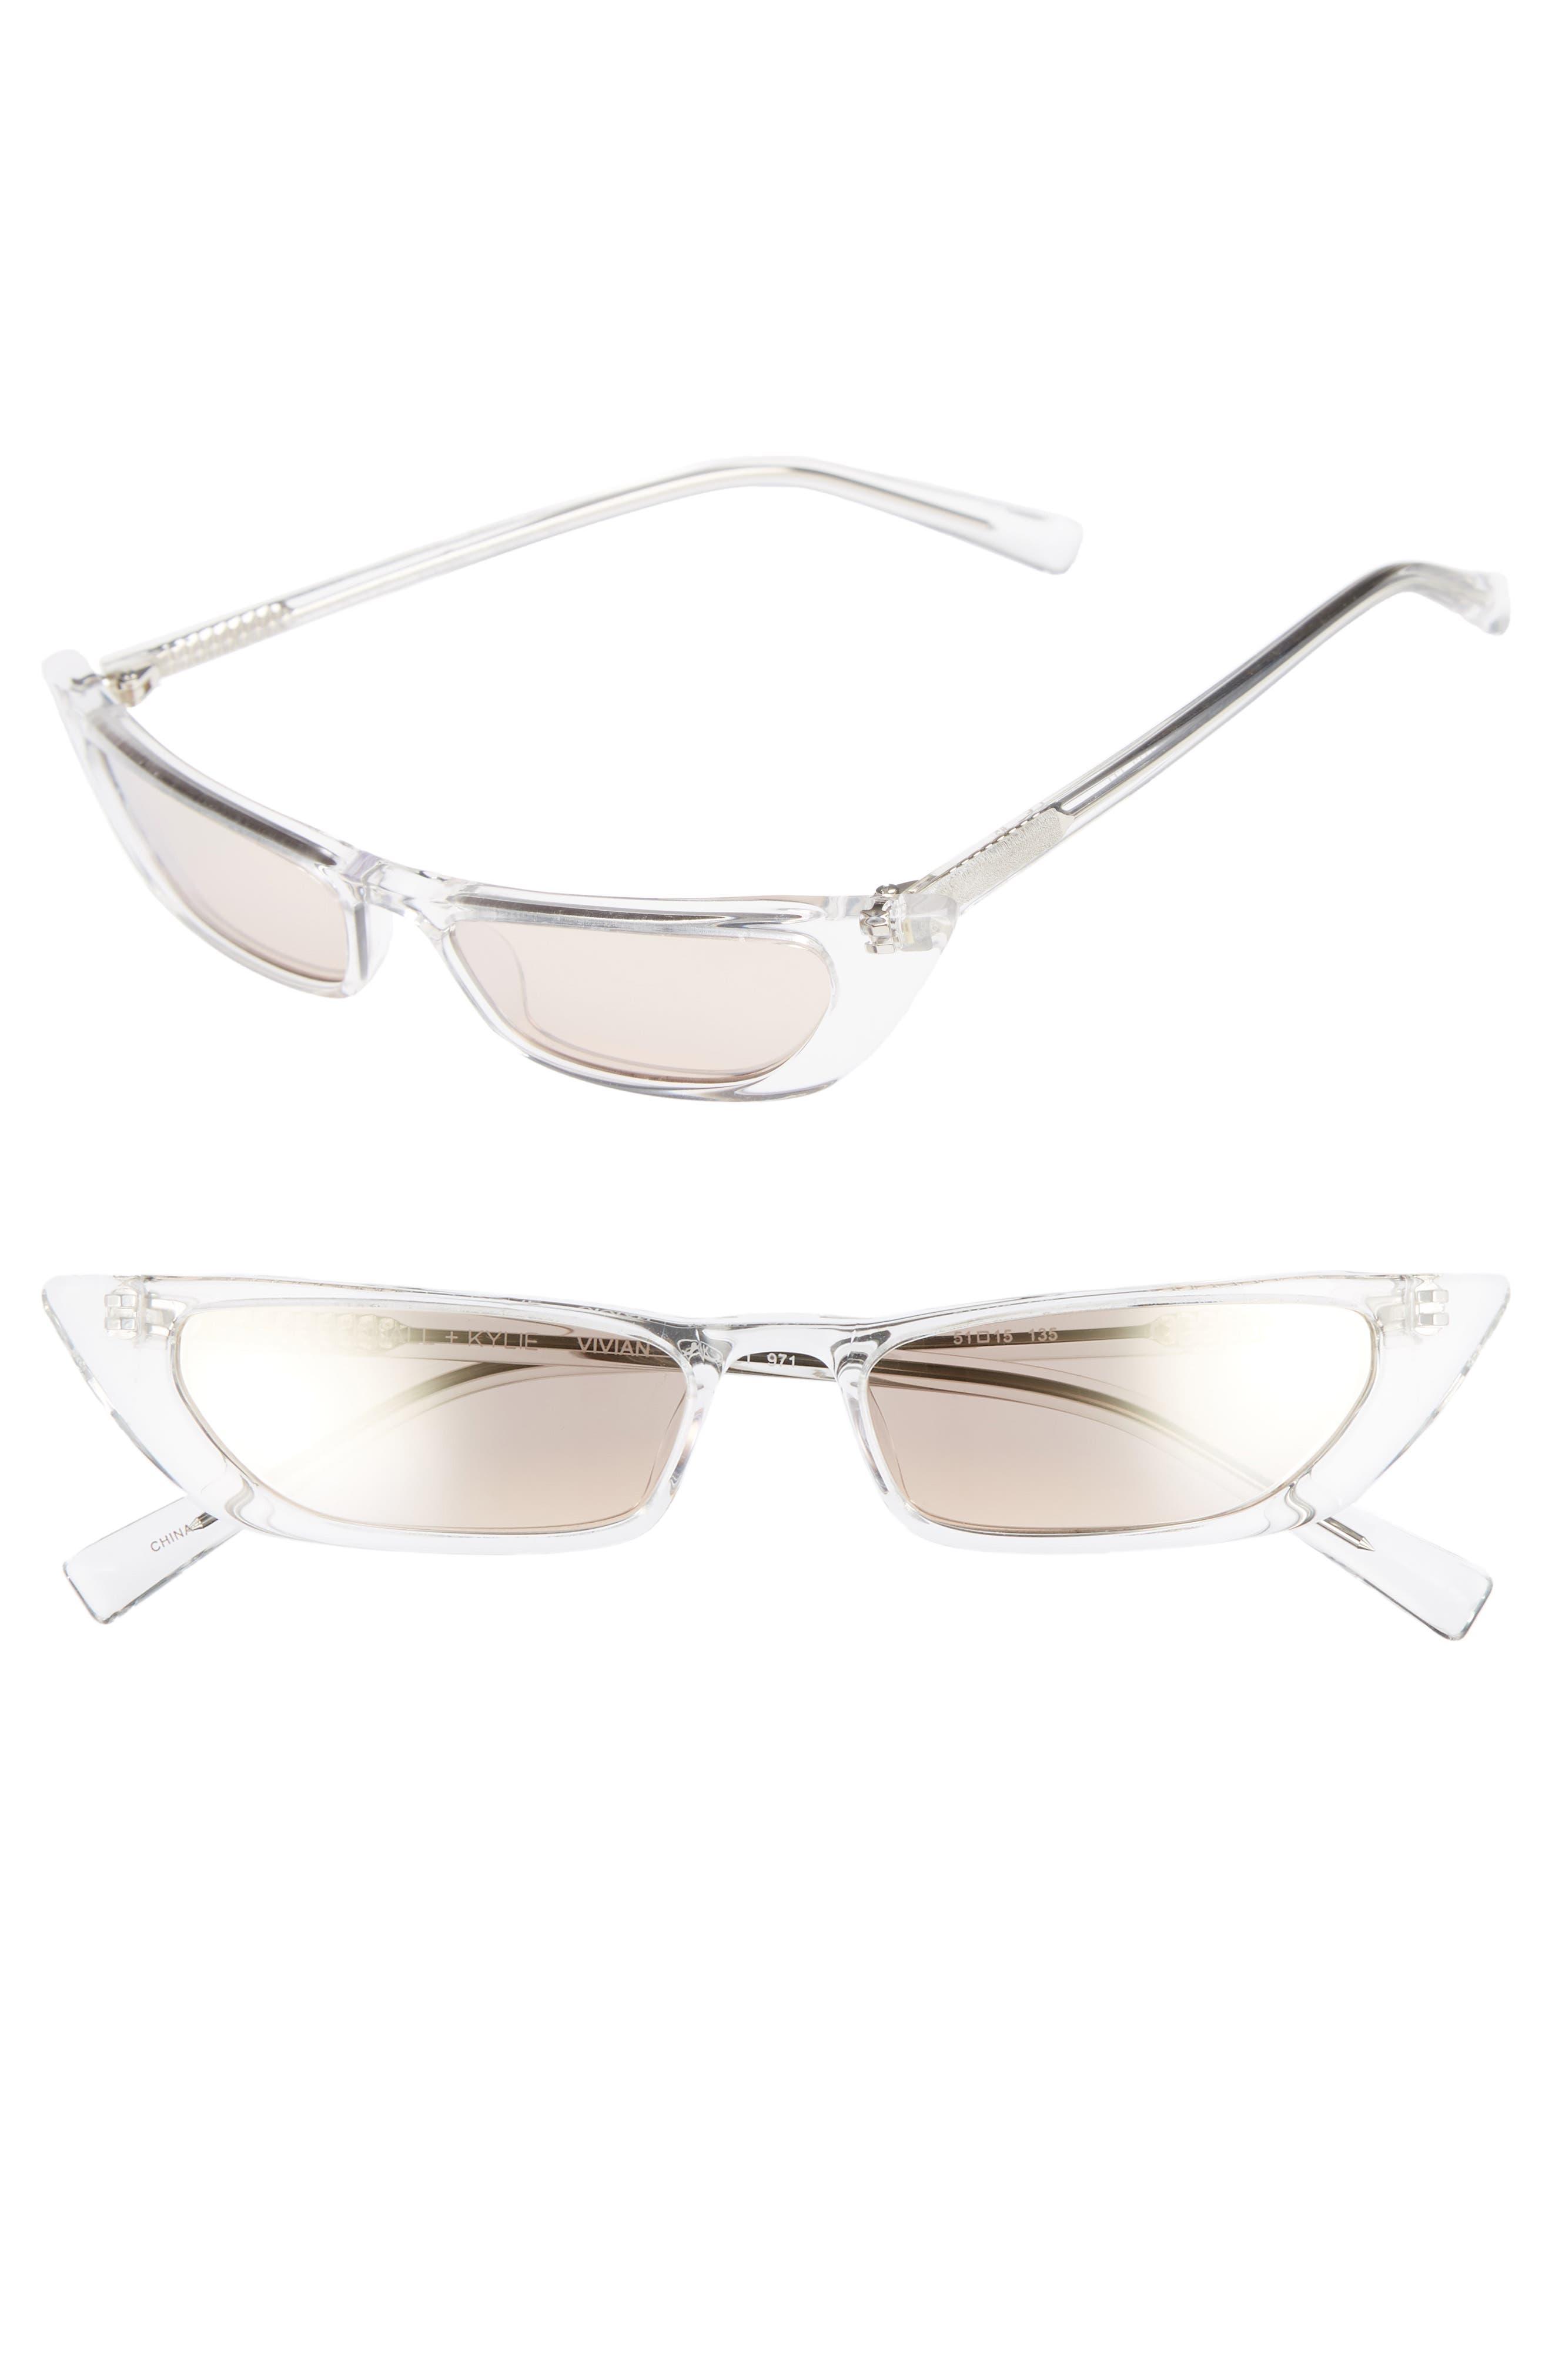 Kendall + Kylie Vivian Extreme 51Mm Cat Eye Sunglasses -